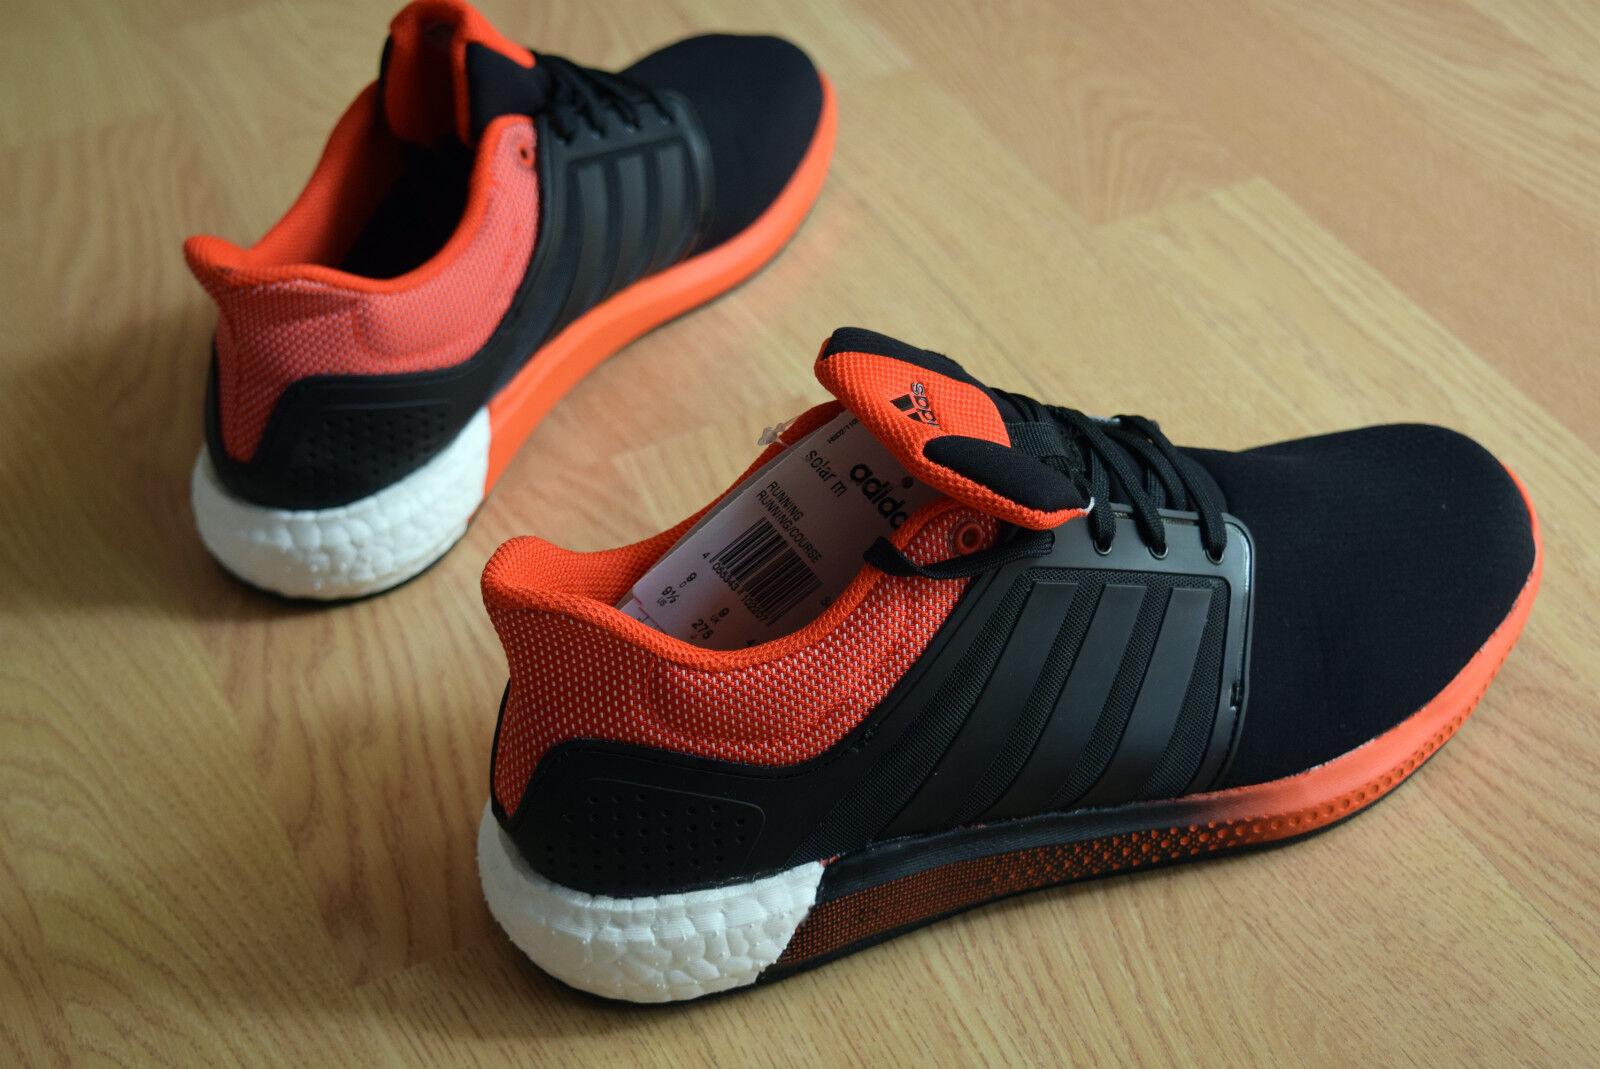 ba1de299d791d adidas Solar Boost M Running Shoes SNEAKERS Trainers Men Black ...